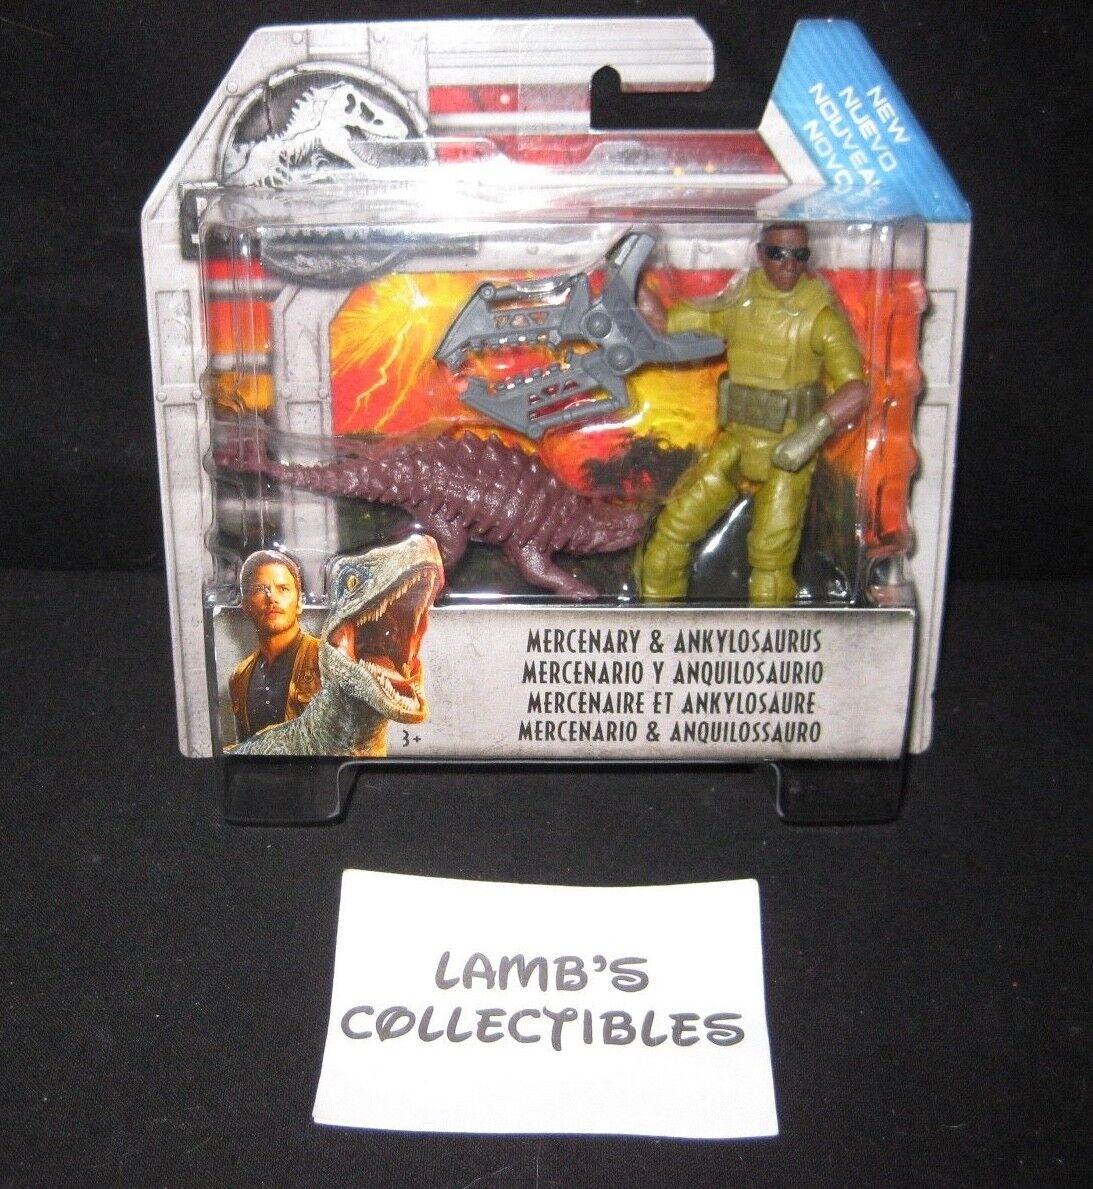 Jurassic World Mercenary  & Ankylosaurus azione cifra giocattoli Mattel  molte sorprese